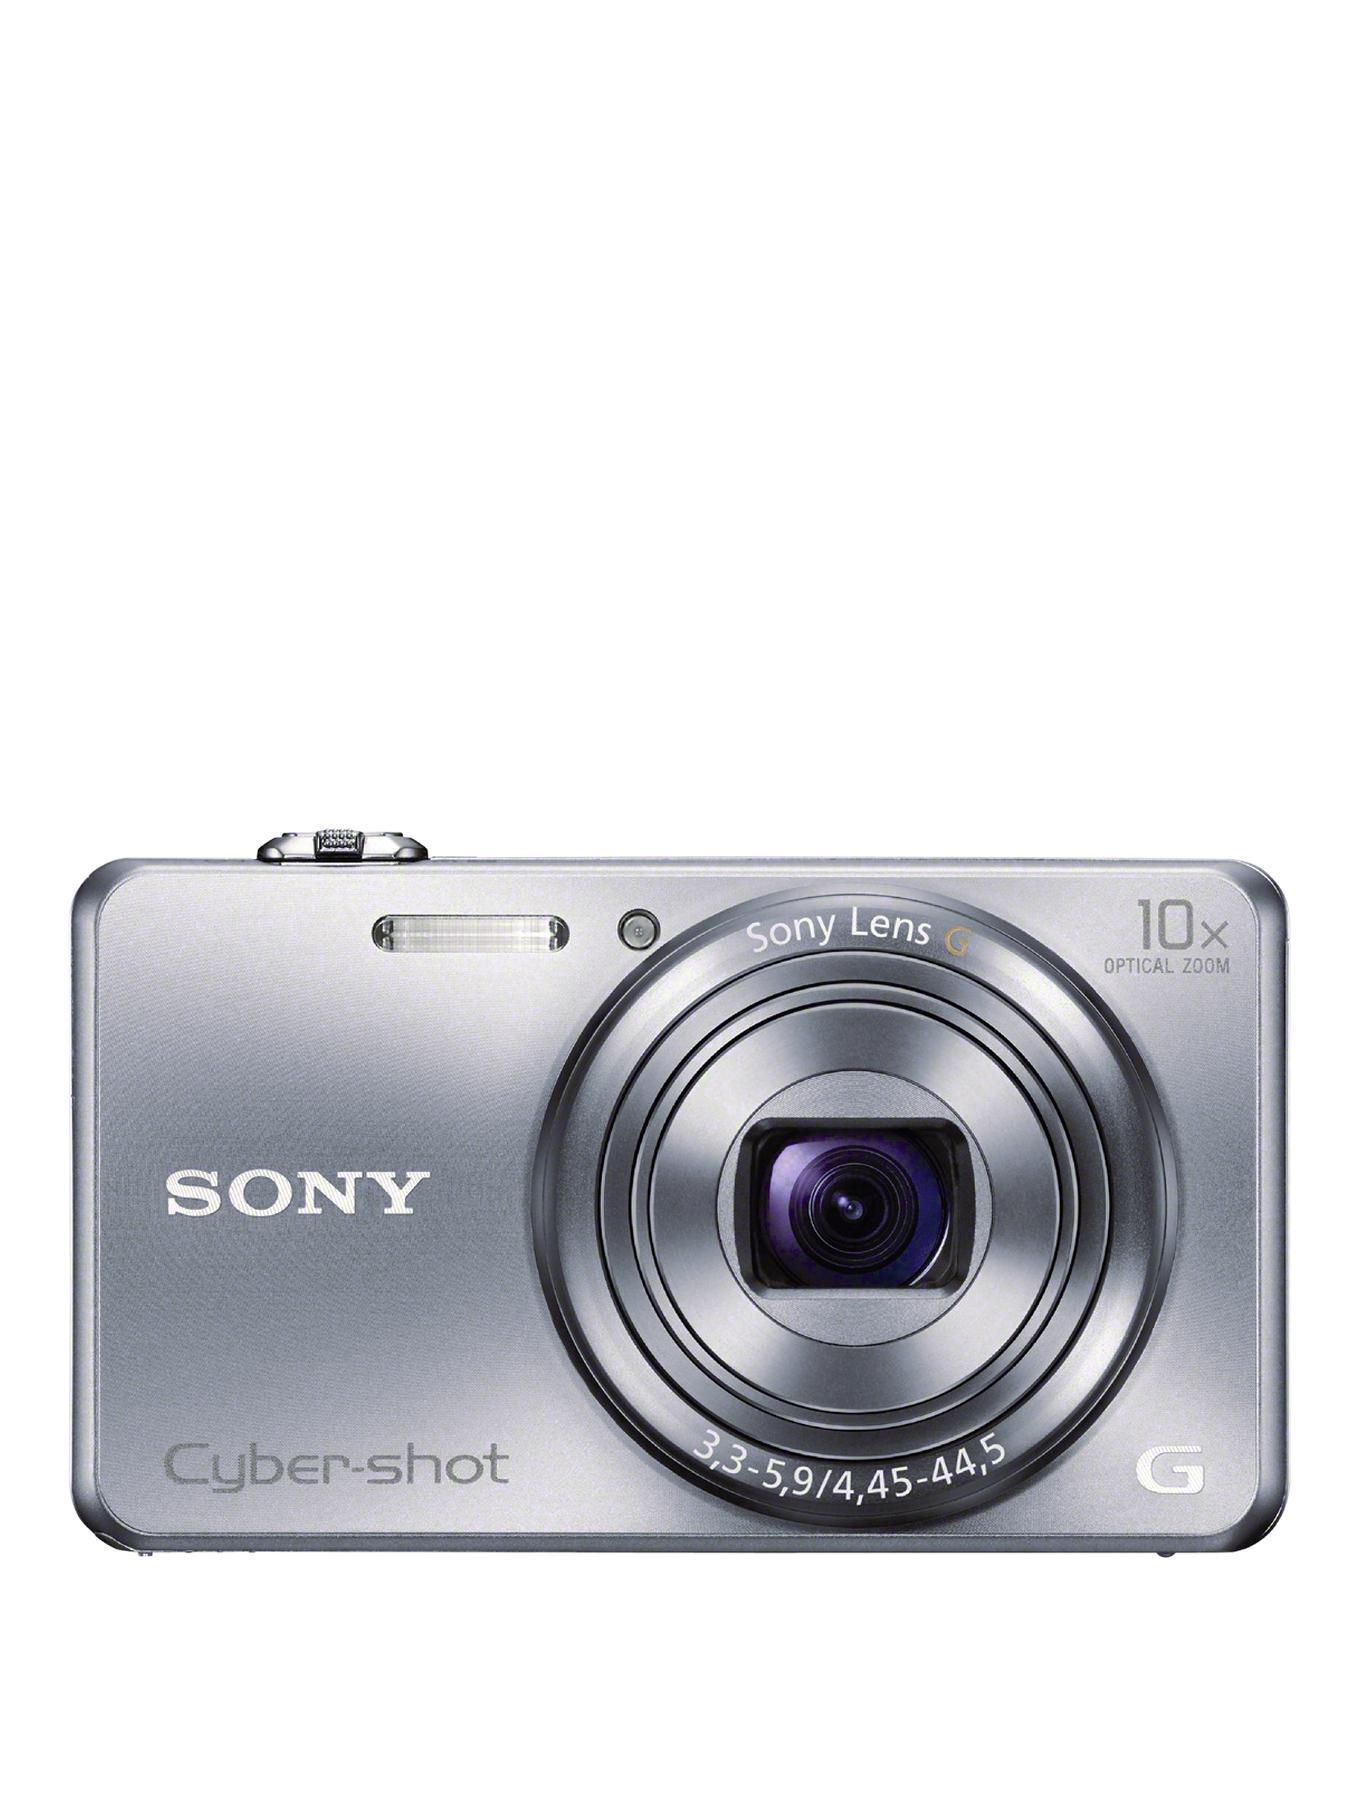 Sony DSCWX200 Digital Compact Camera